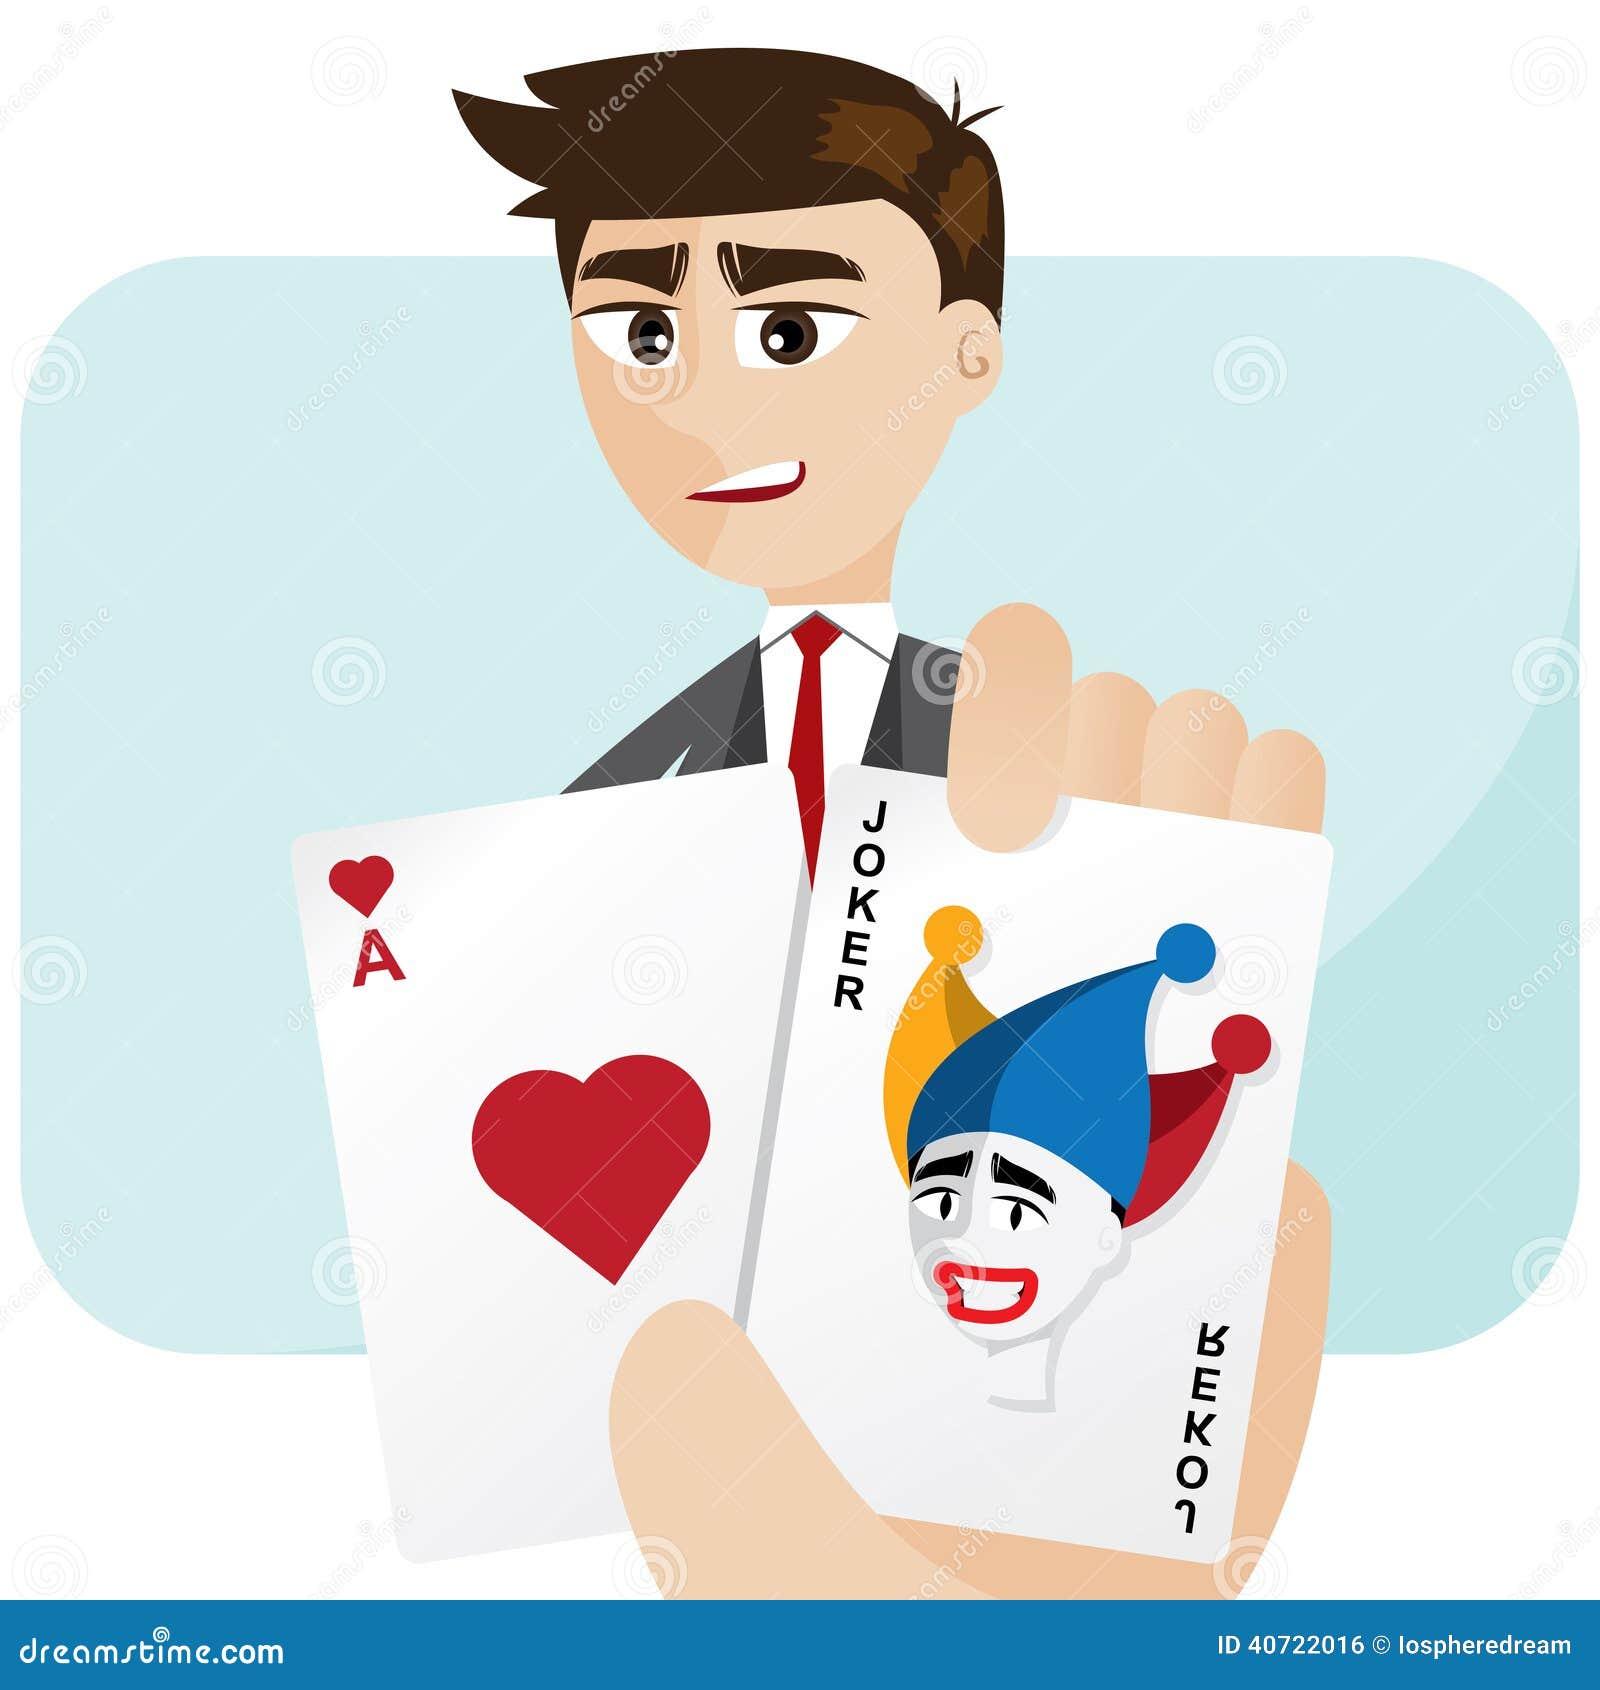 Cartoon businessman draw joker card